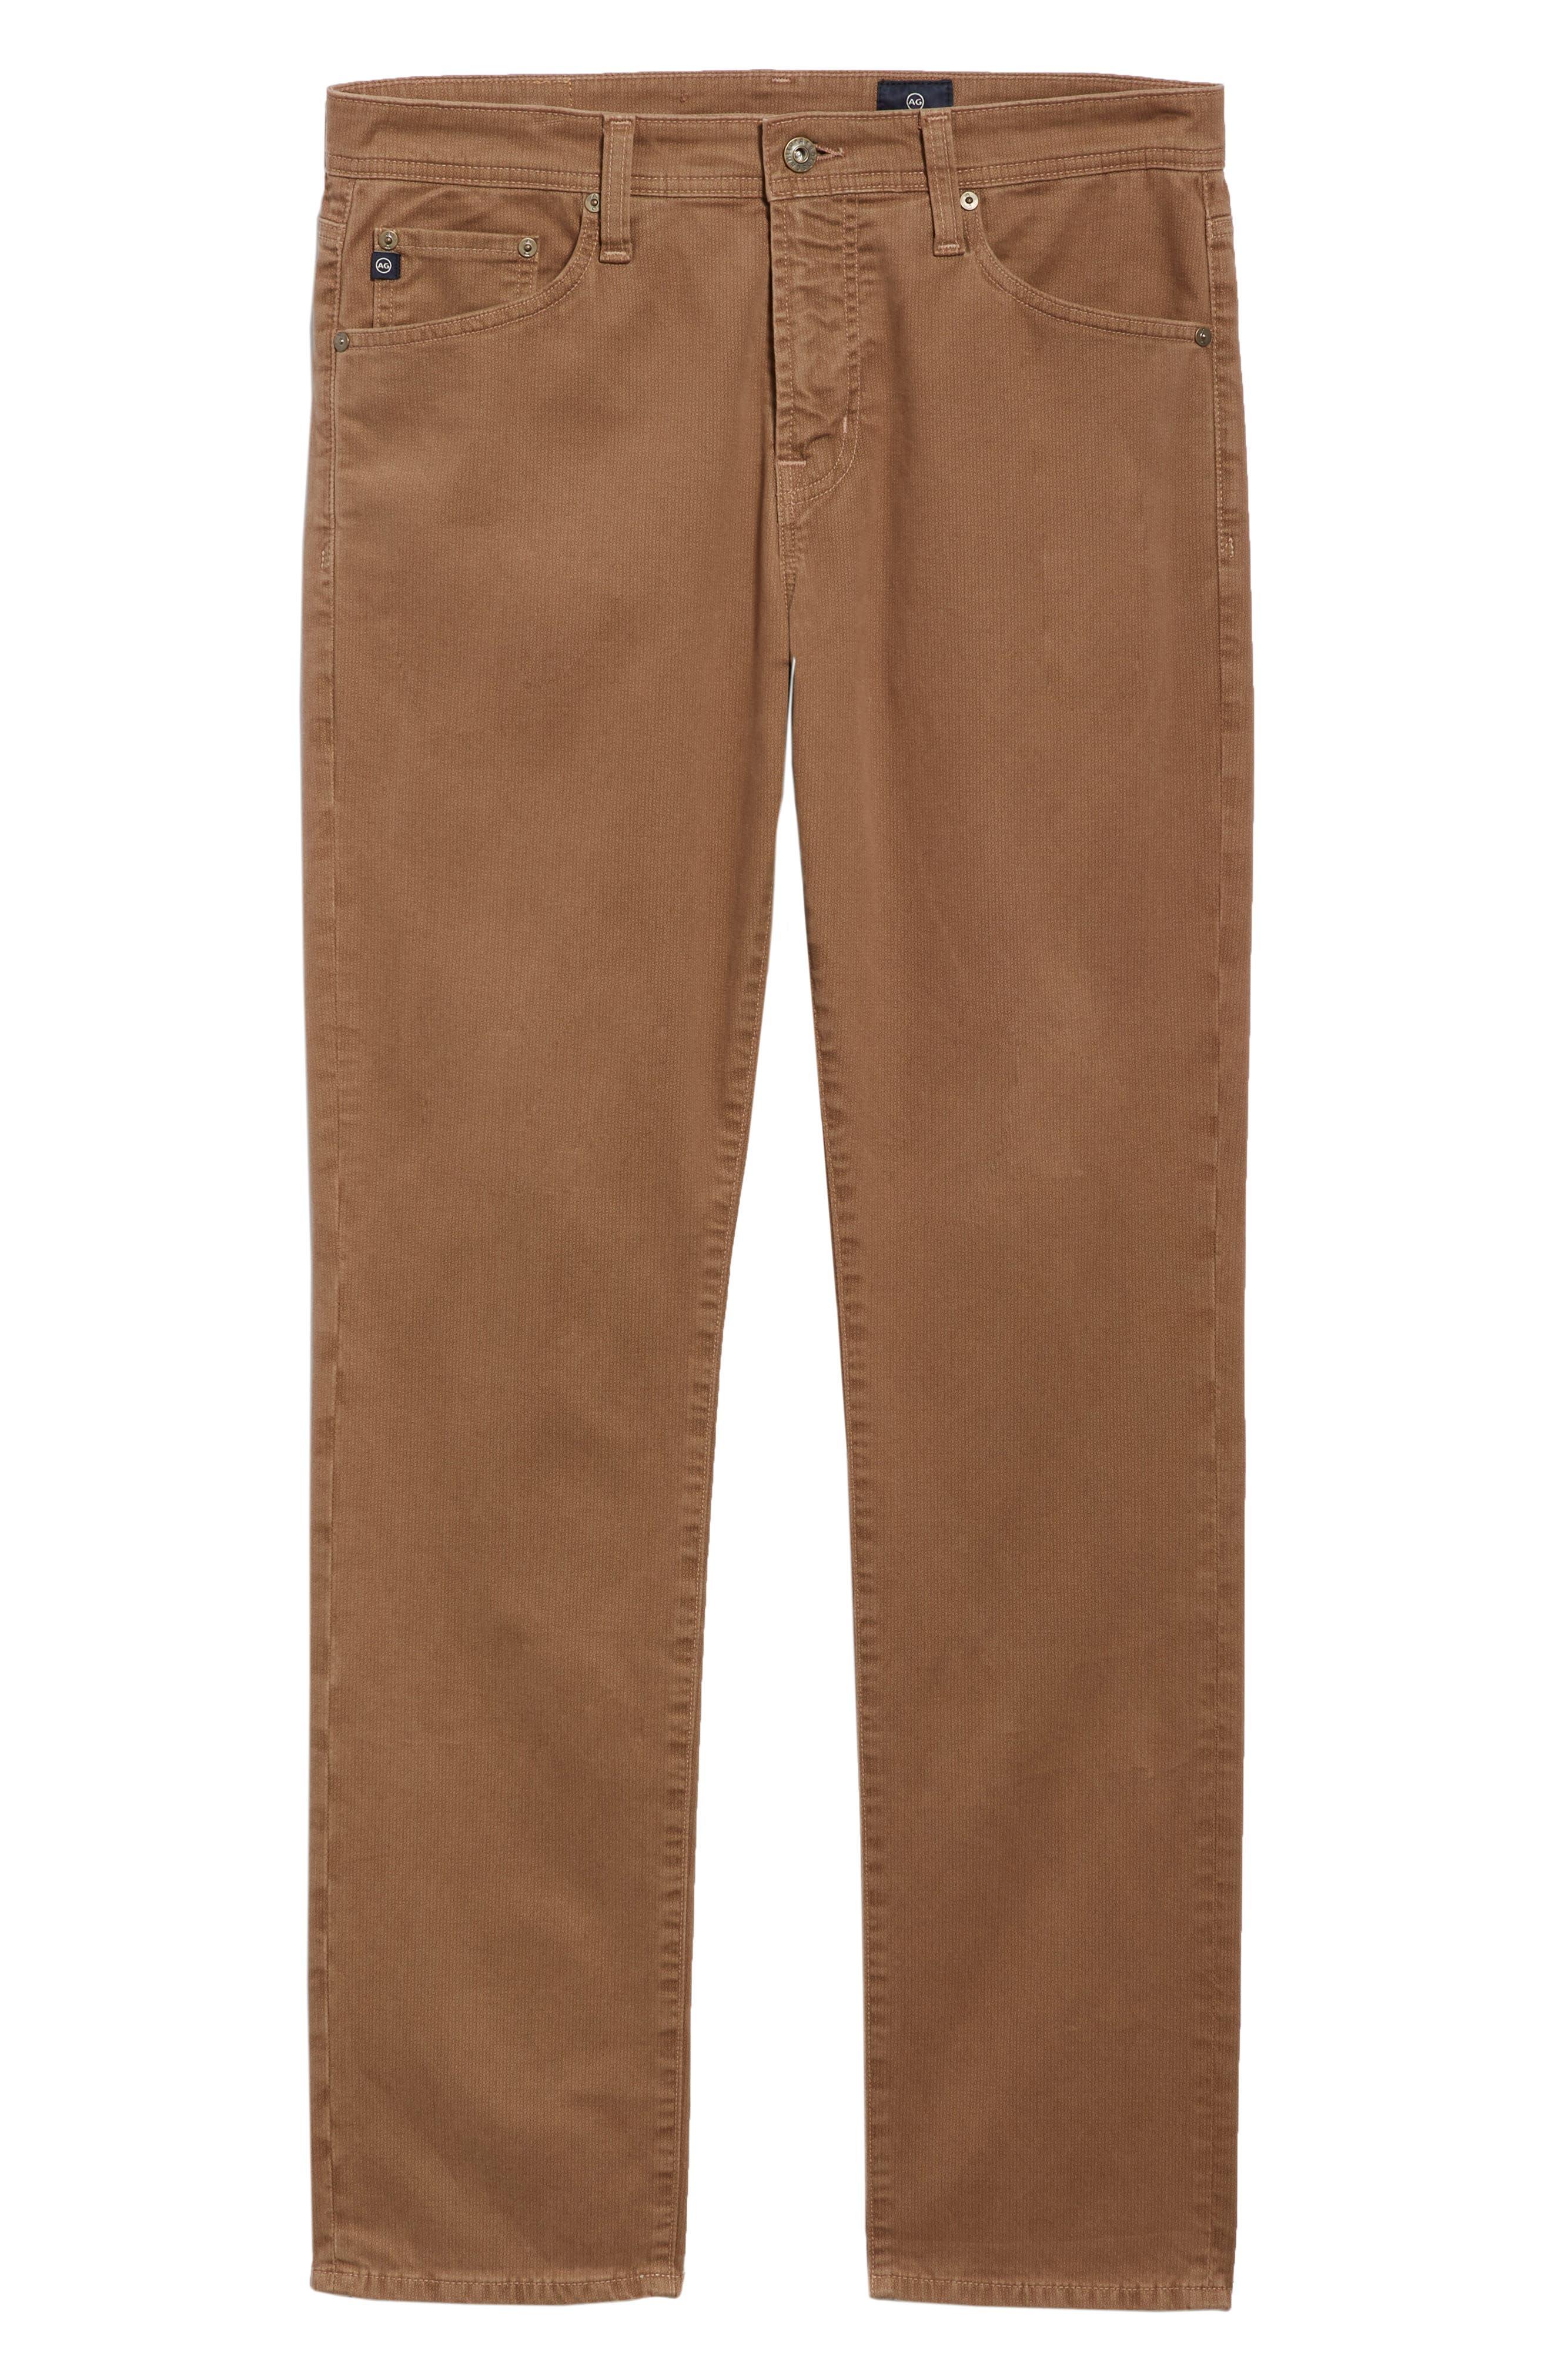 Everett SUD Print Slim Straight Leg Pants,                             Alternate thumbnail 6, color,                             MICRO GEO WHEAT